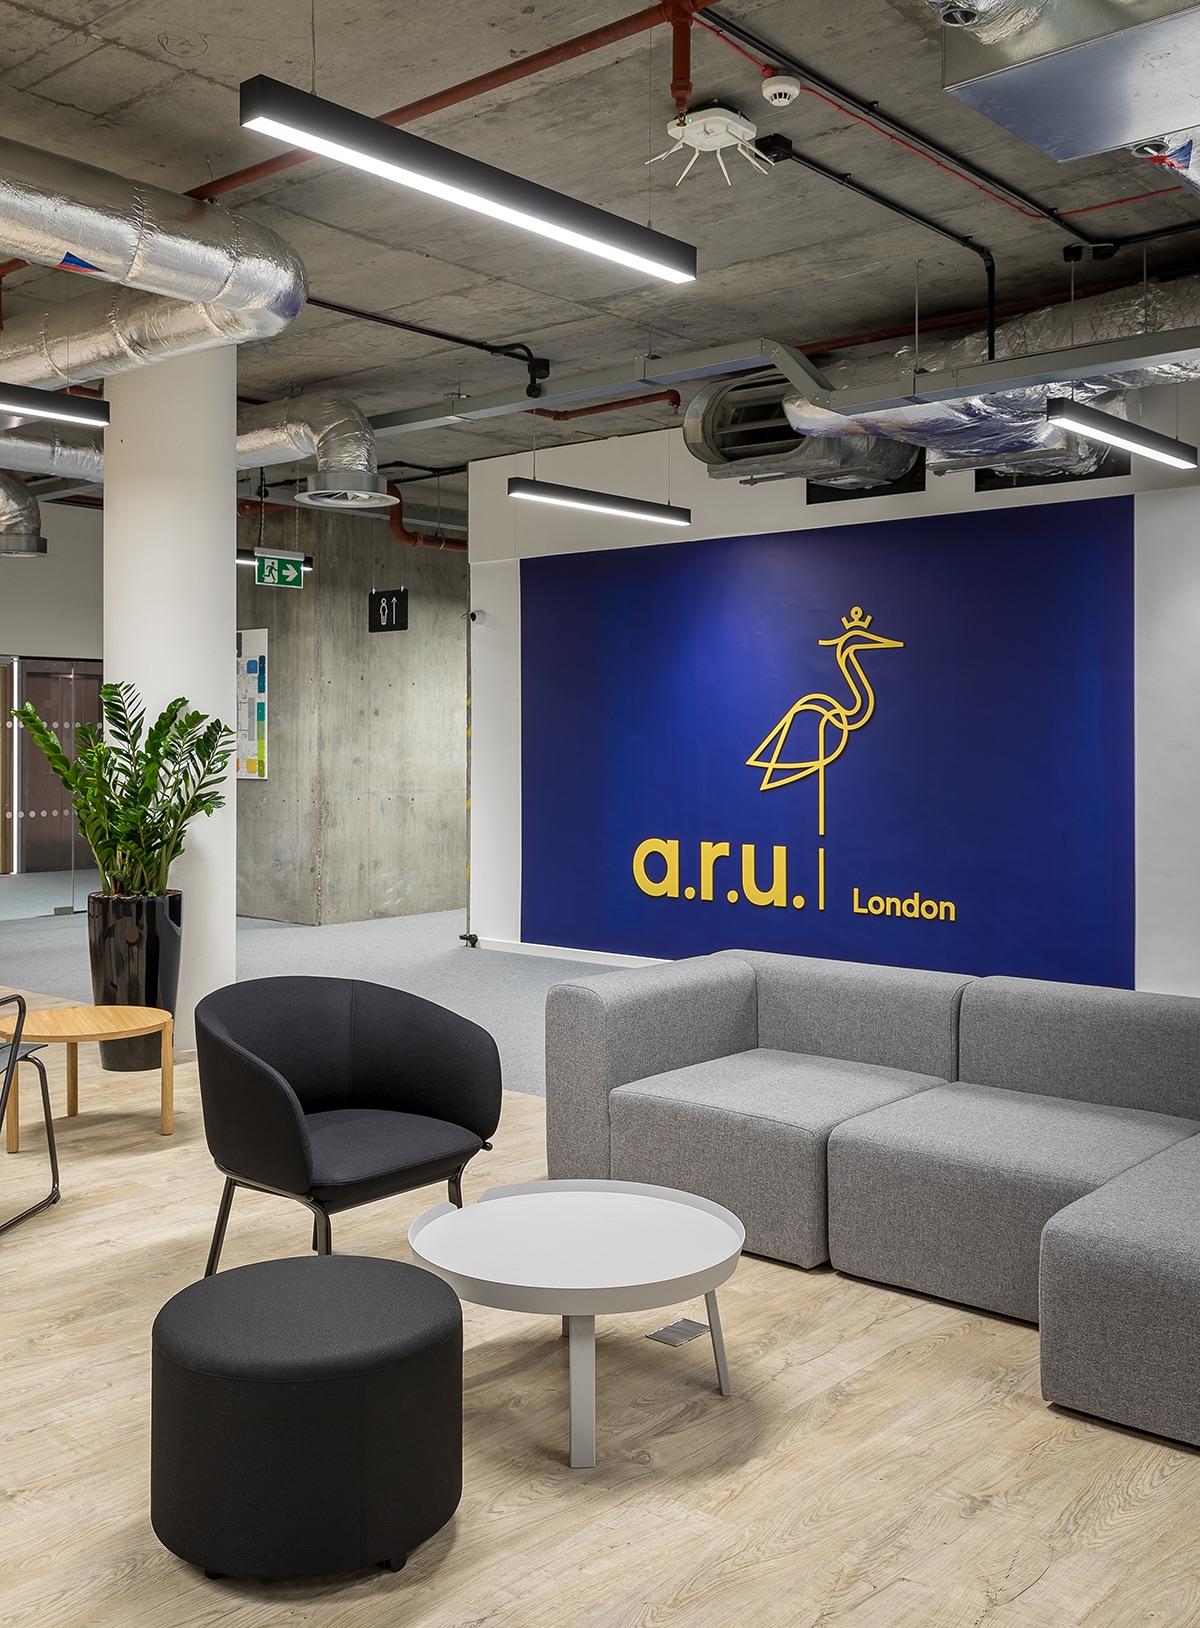 anglia-ruskin-university-office-london-19